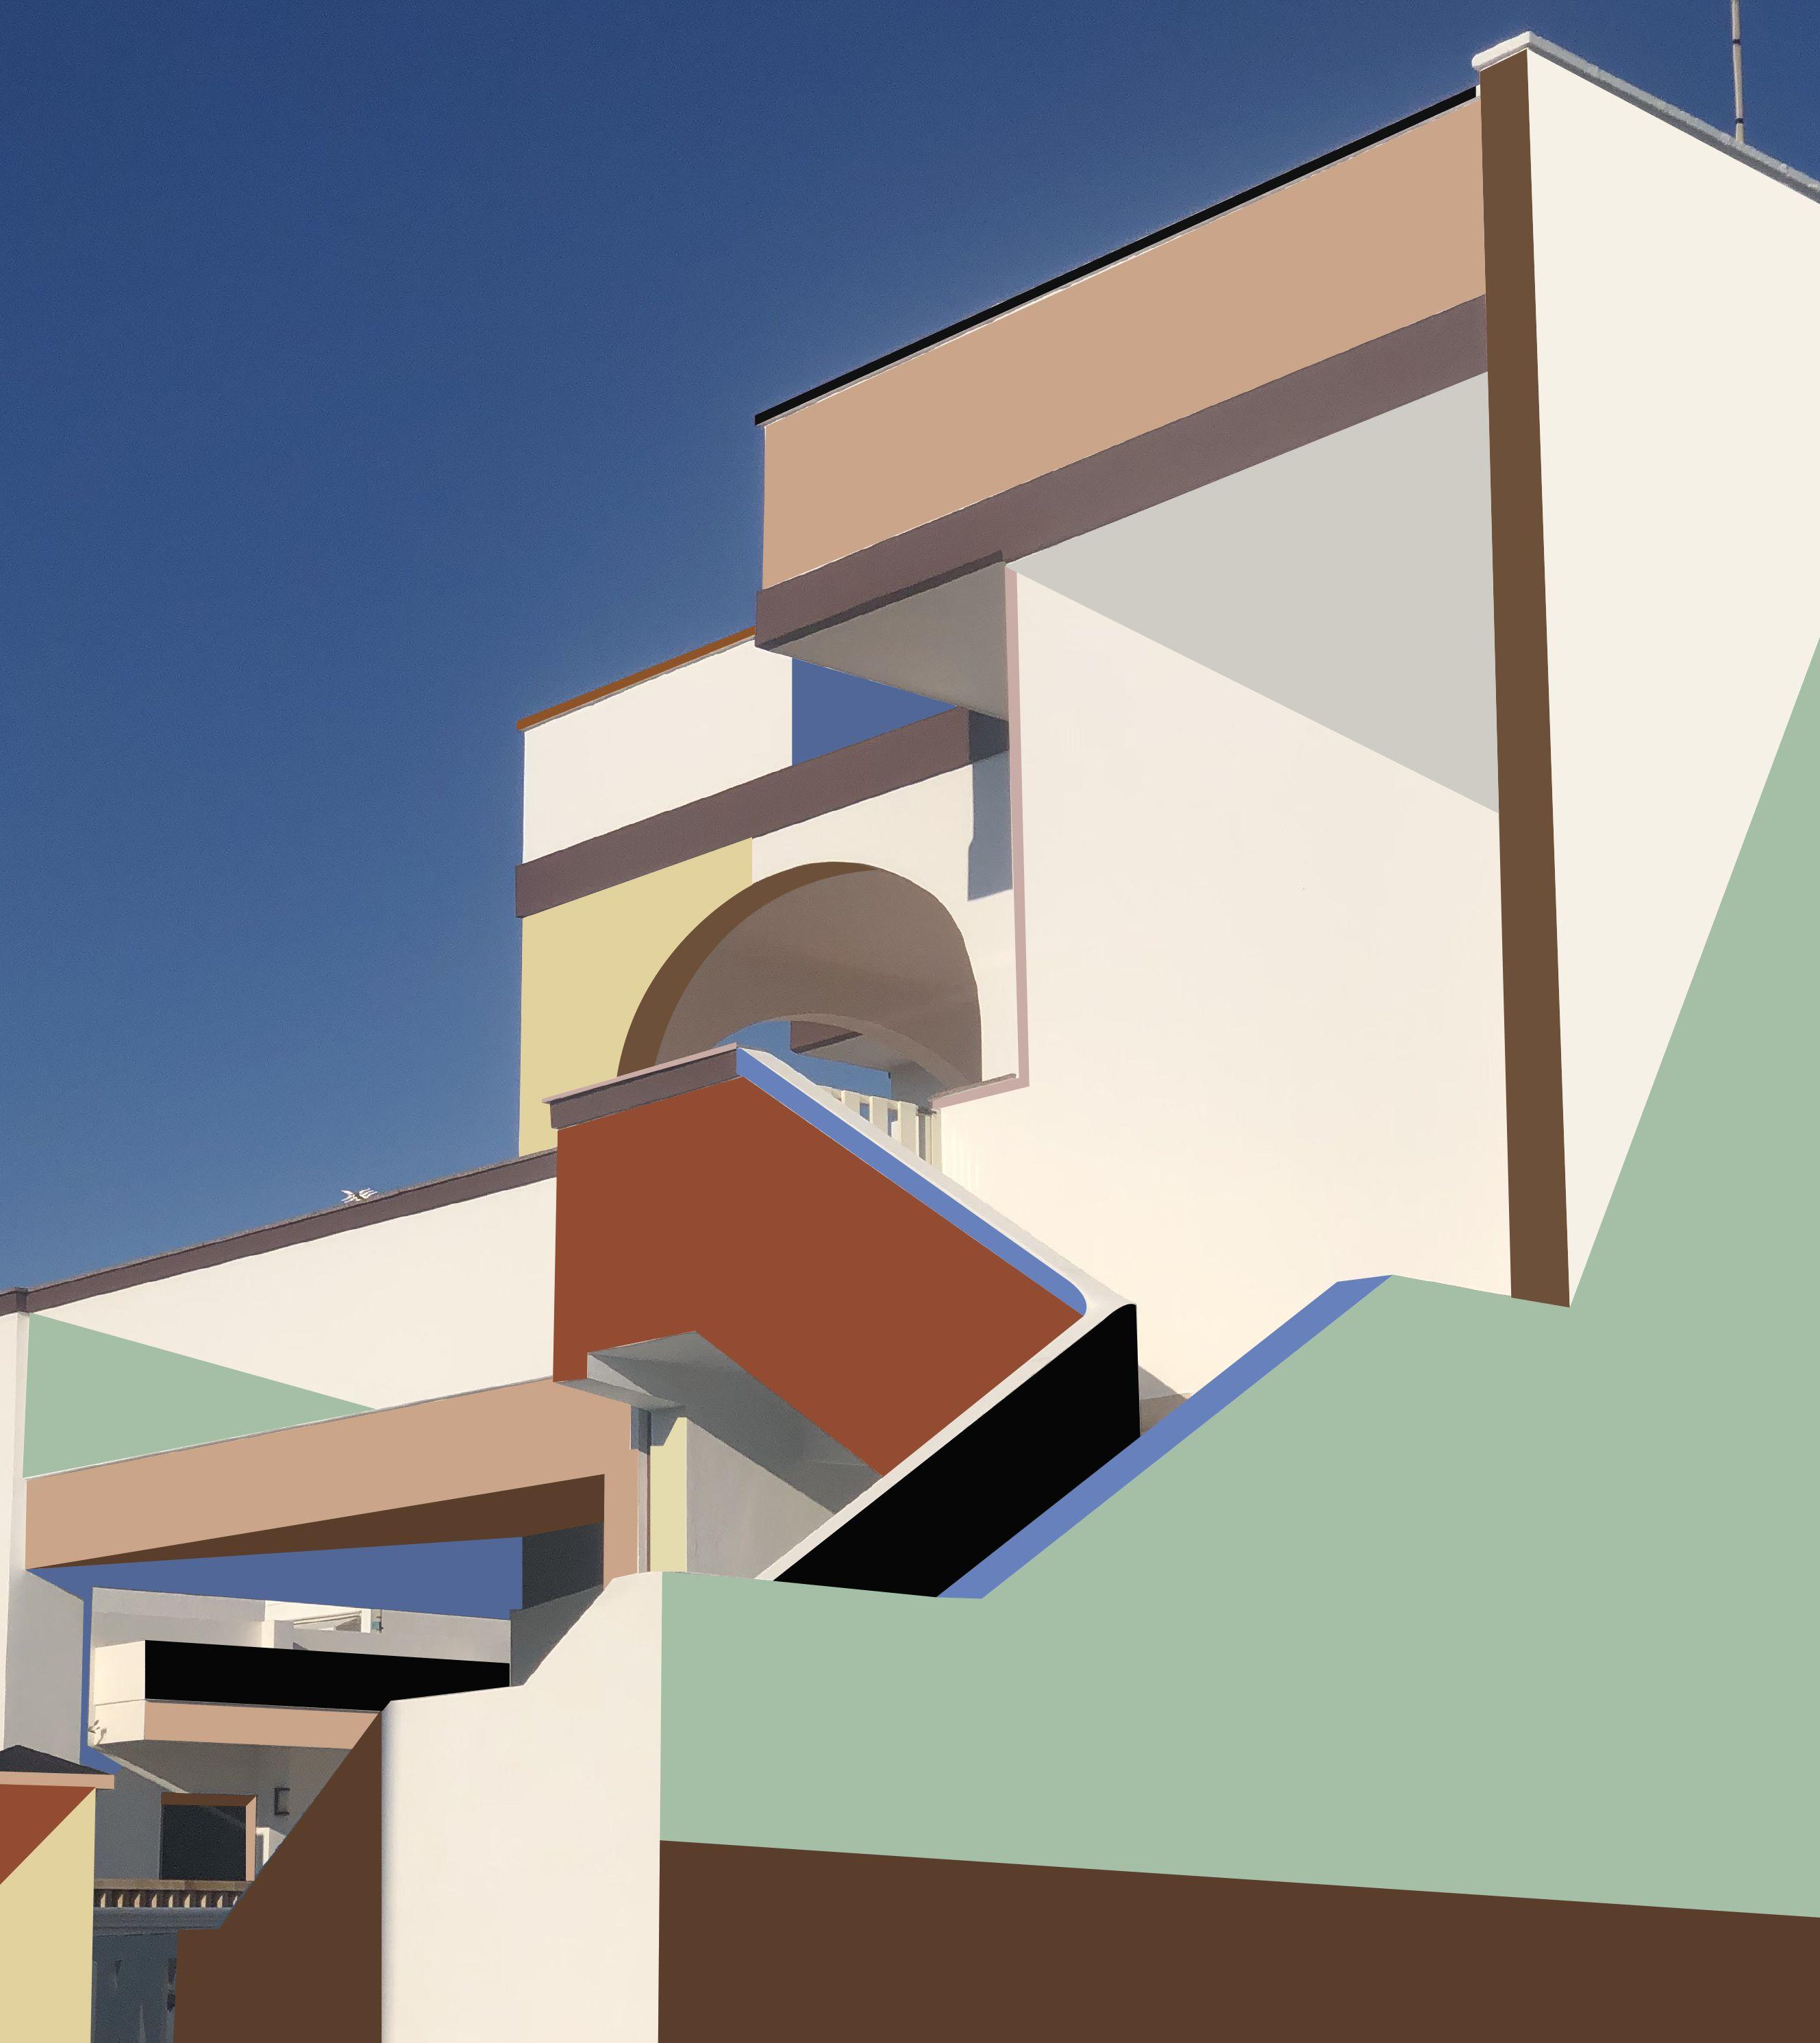 f e e l i n g s • the thing that changes people's minds —— . . . . . . #architecture #art #minimal #modernism #interiorarchitecture #openhousemagazine #brutalism #sightunseen #wrapmagazine #itsnicethat #imaginarymagnitude #minimalchile #sayhito_ #brutalist #excellent_structure #designboom #designmilk #minimalismworld #brutalistarchitecture #architectureporn #ig_minimalshots #apricotmagazine #concretearchitecture #forevermagazine